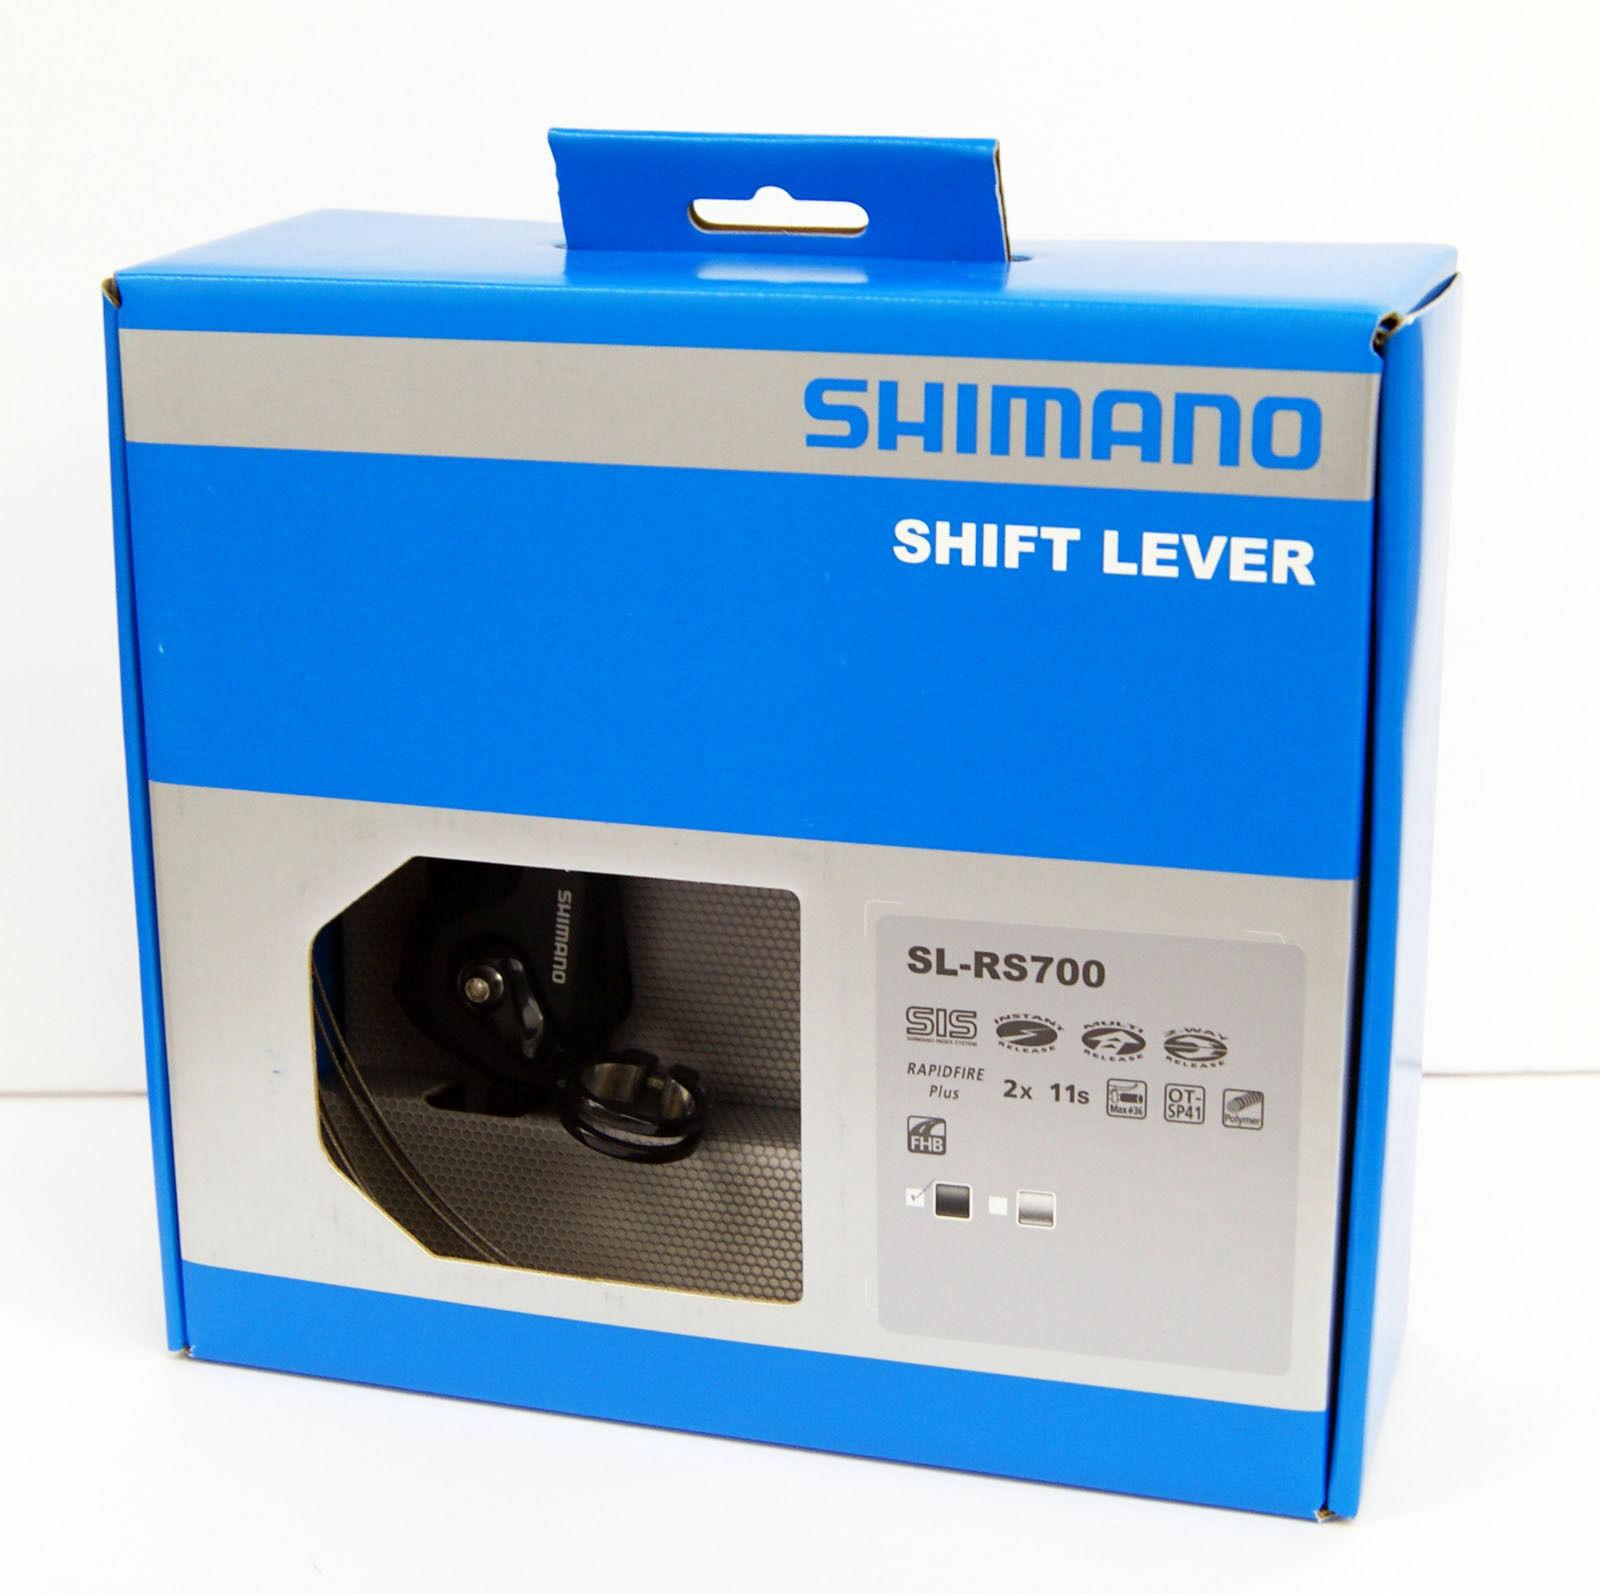 SHIMANO Road Bicycle Shift Lever Set SL-RS700-I